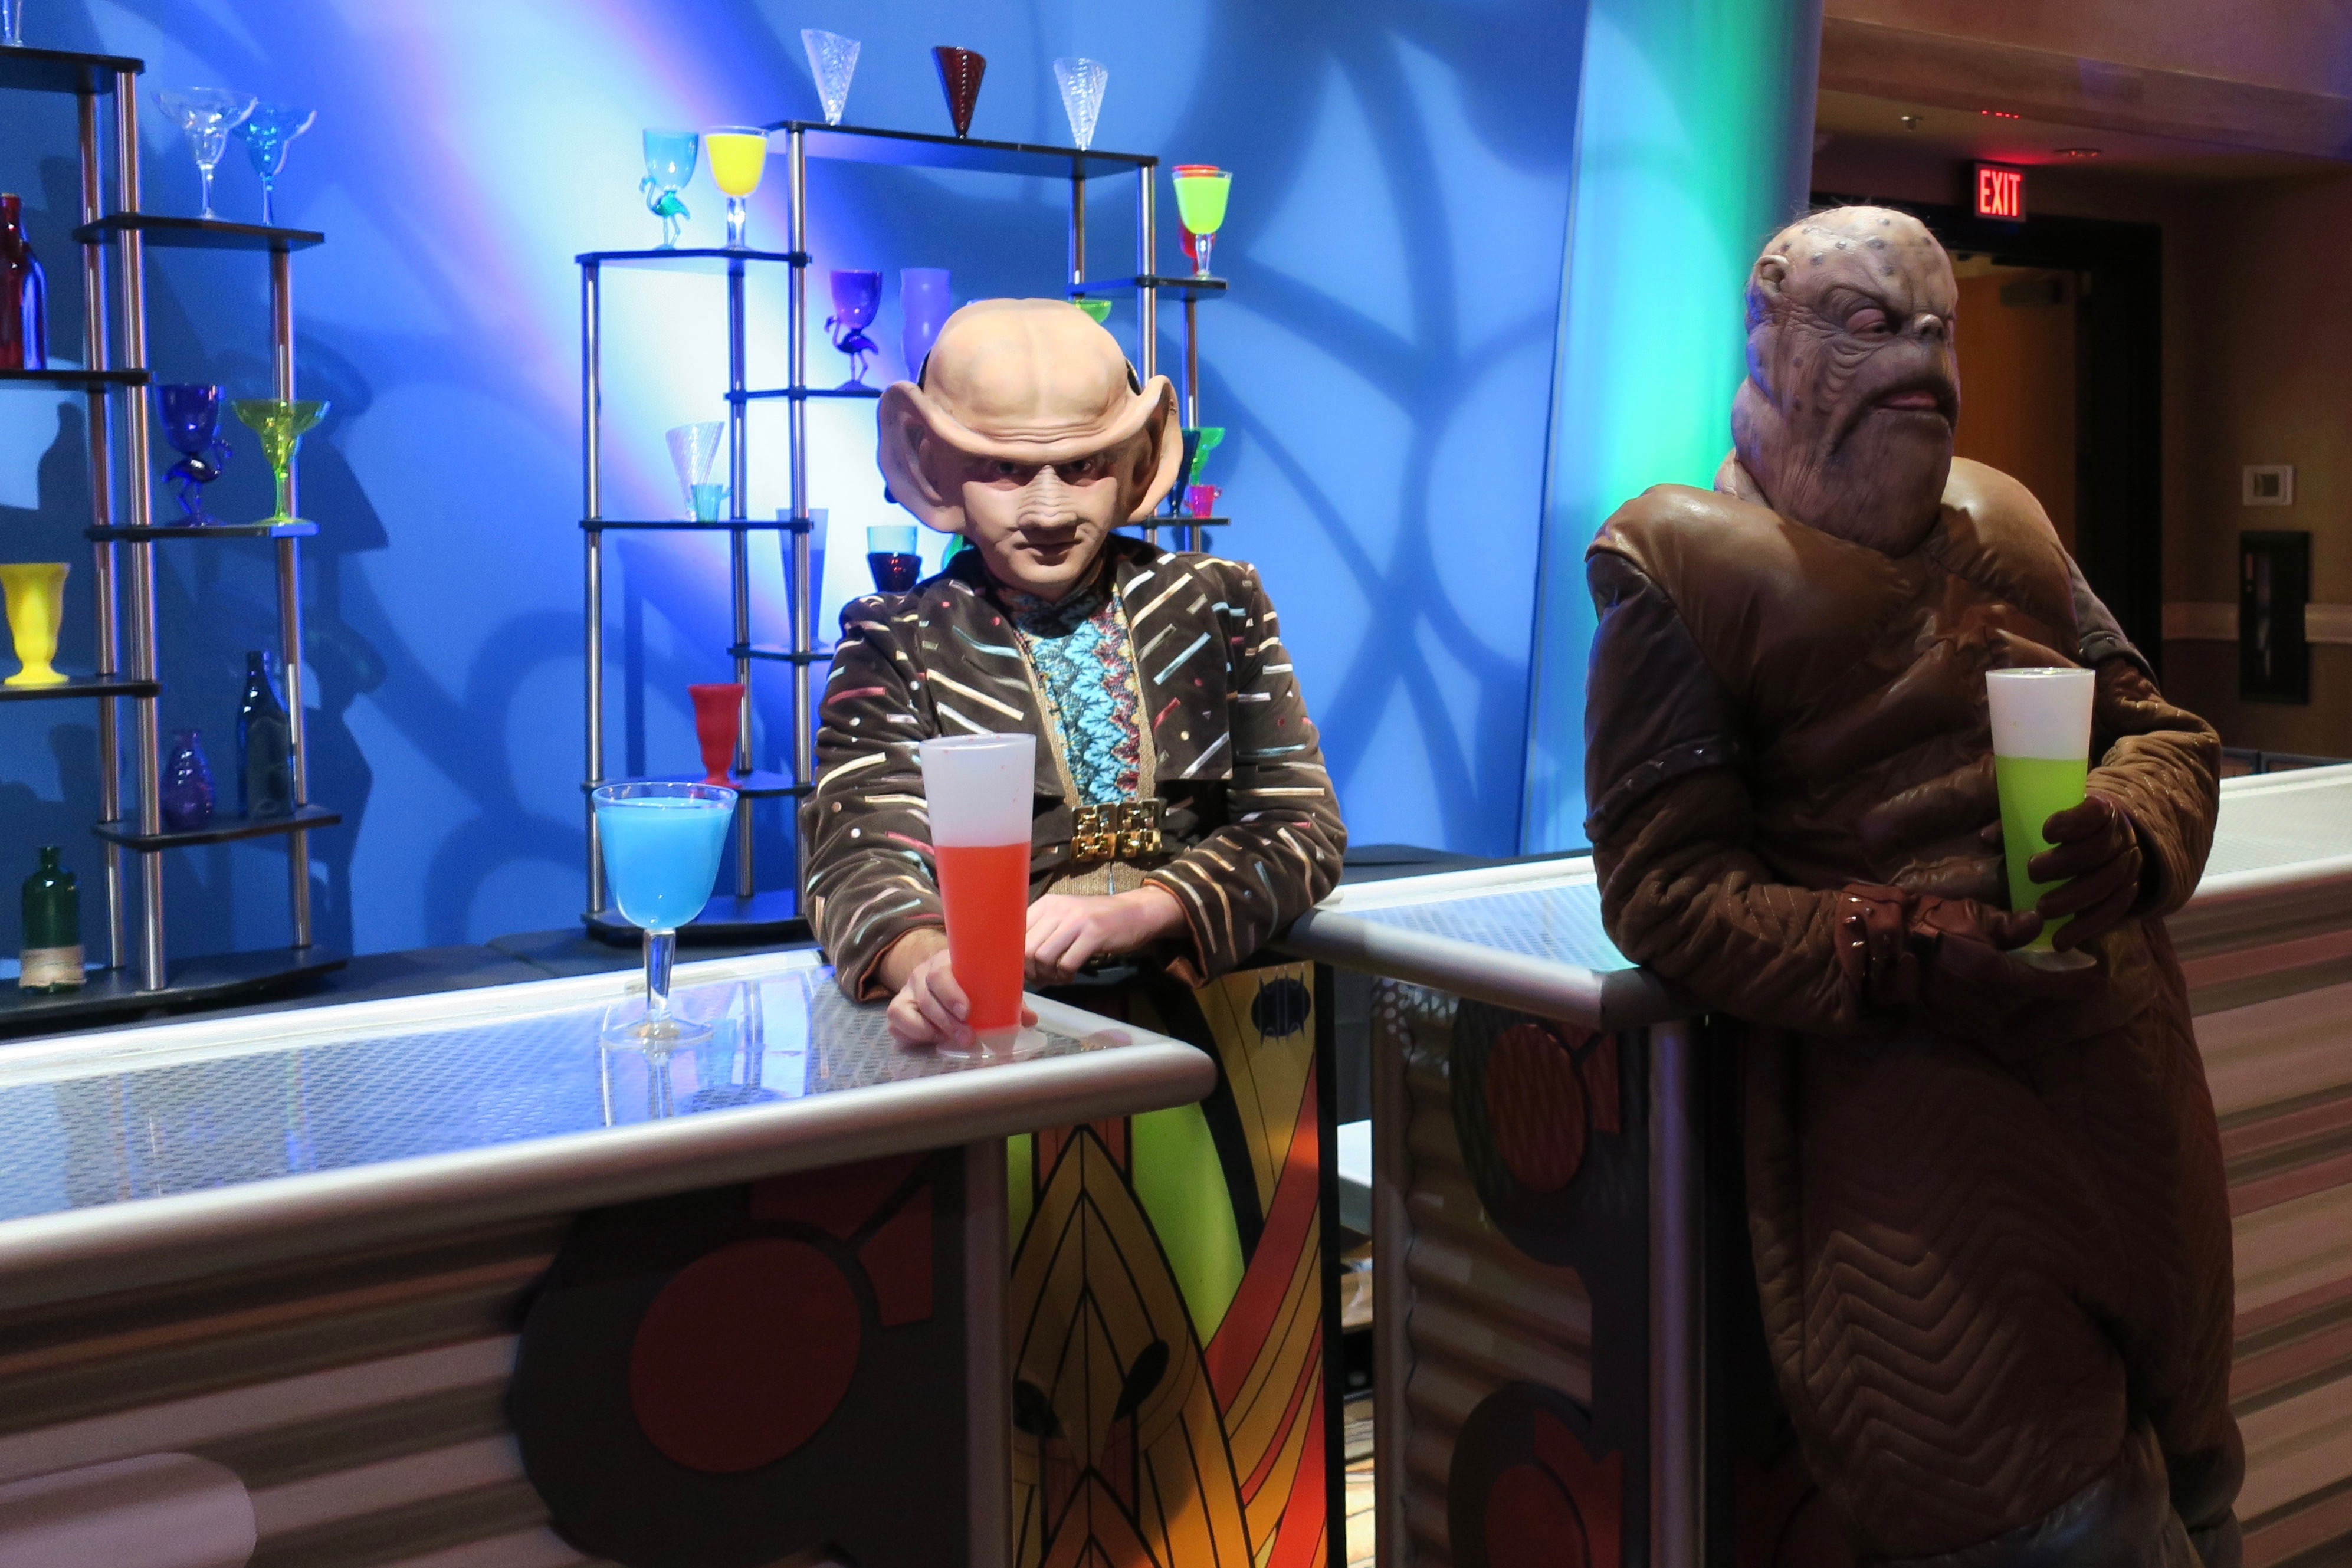 Fans Celebrate Star Trek S 50th Anniversary Techcrunch